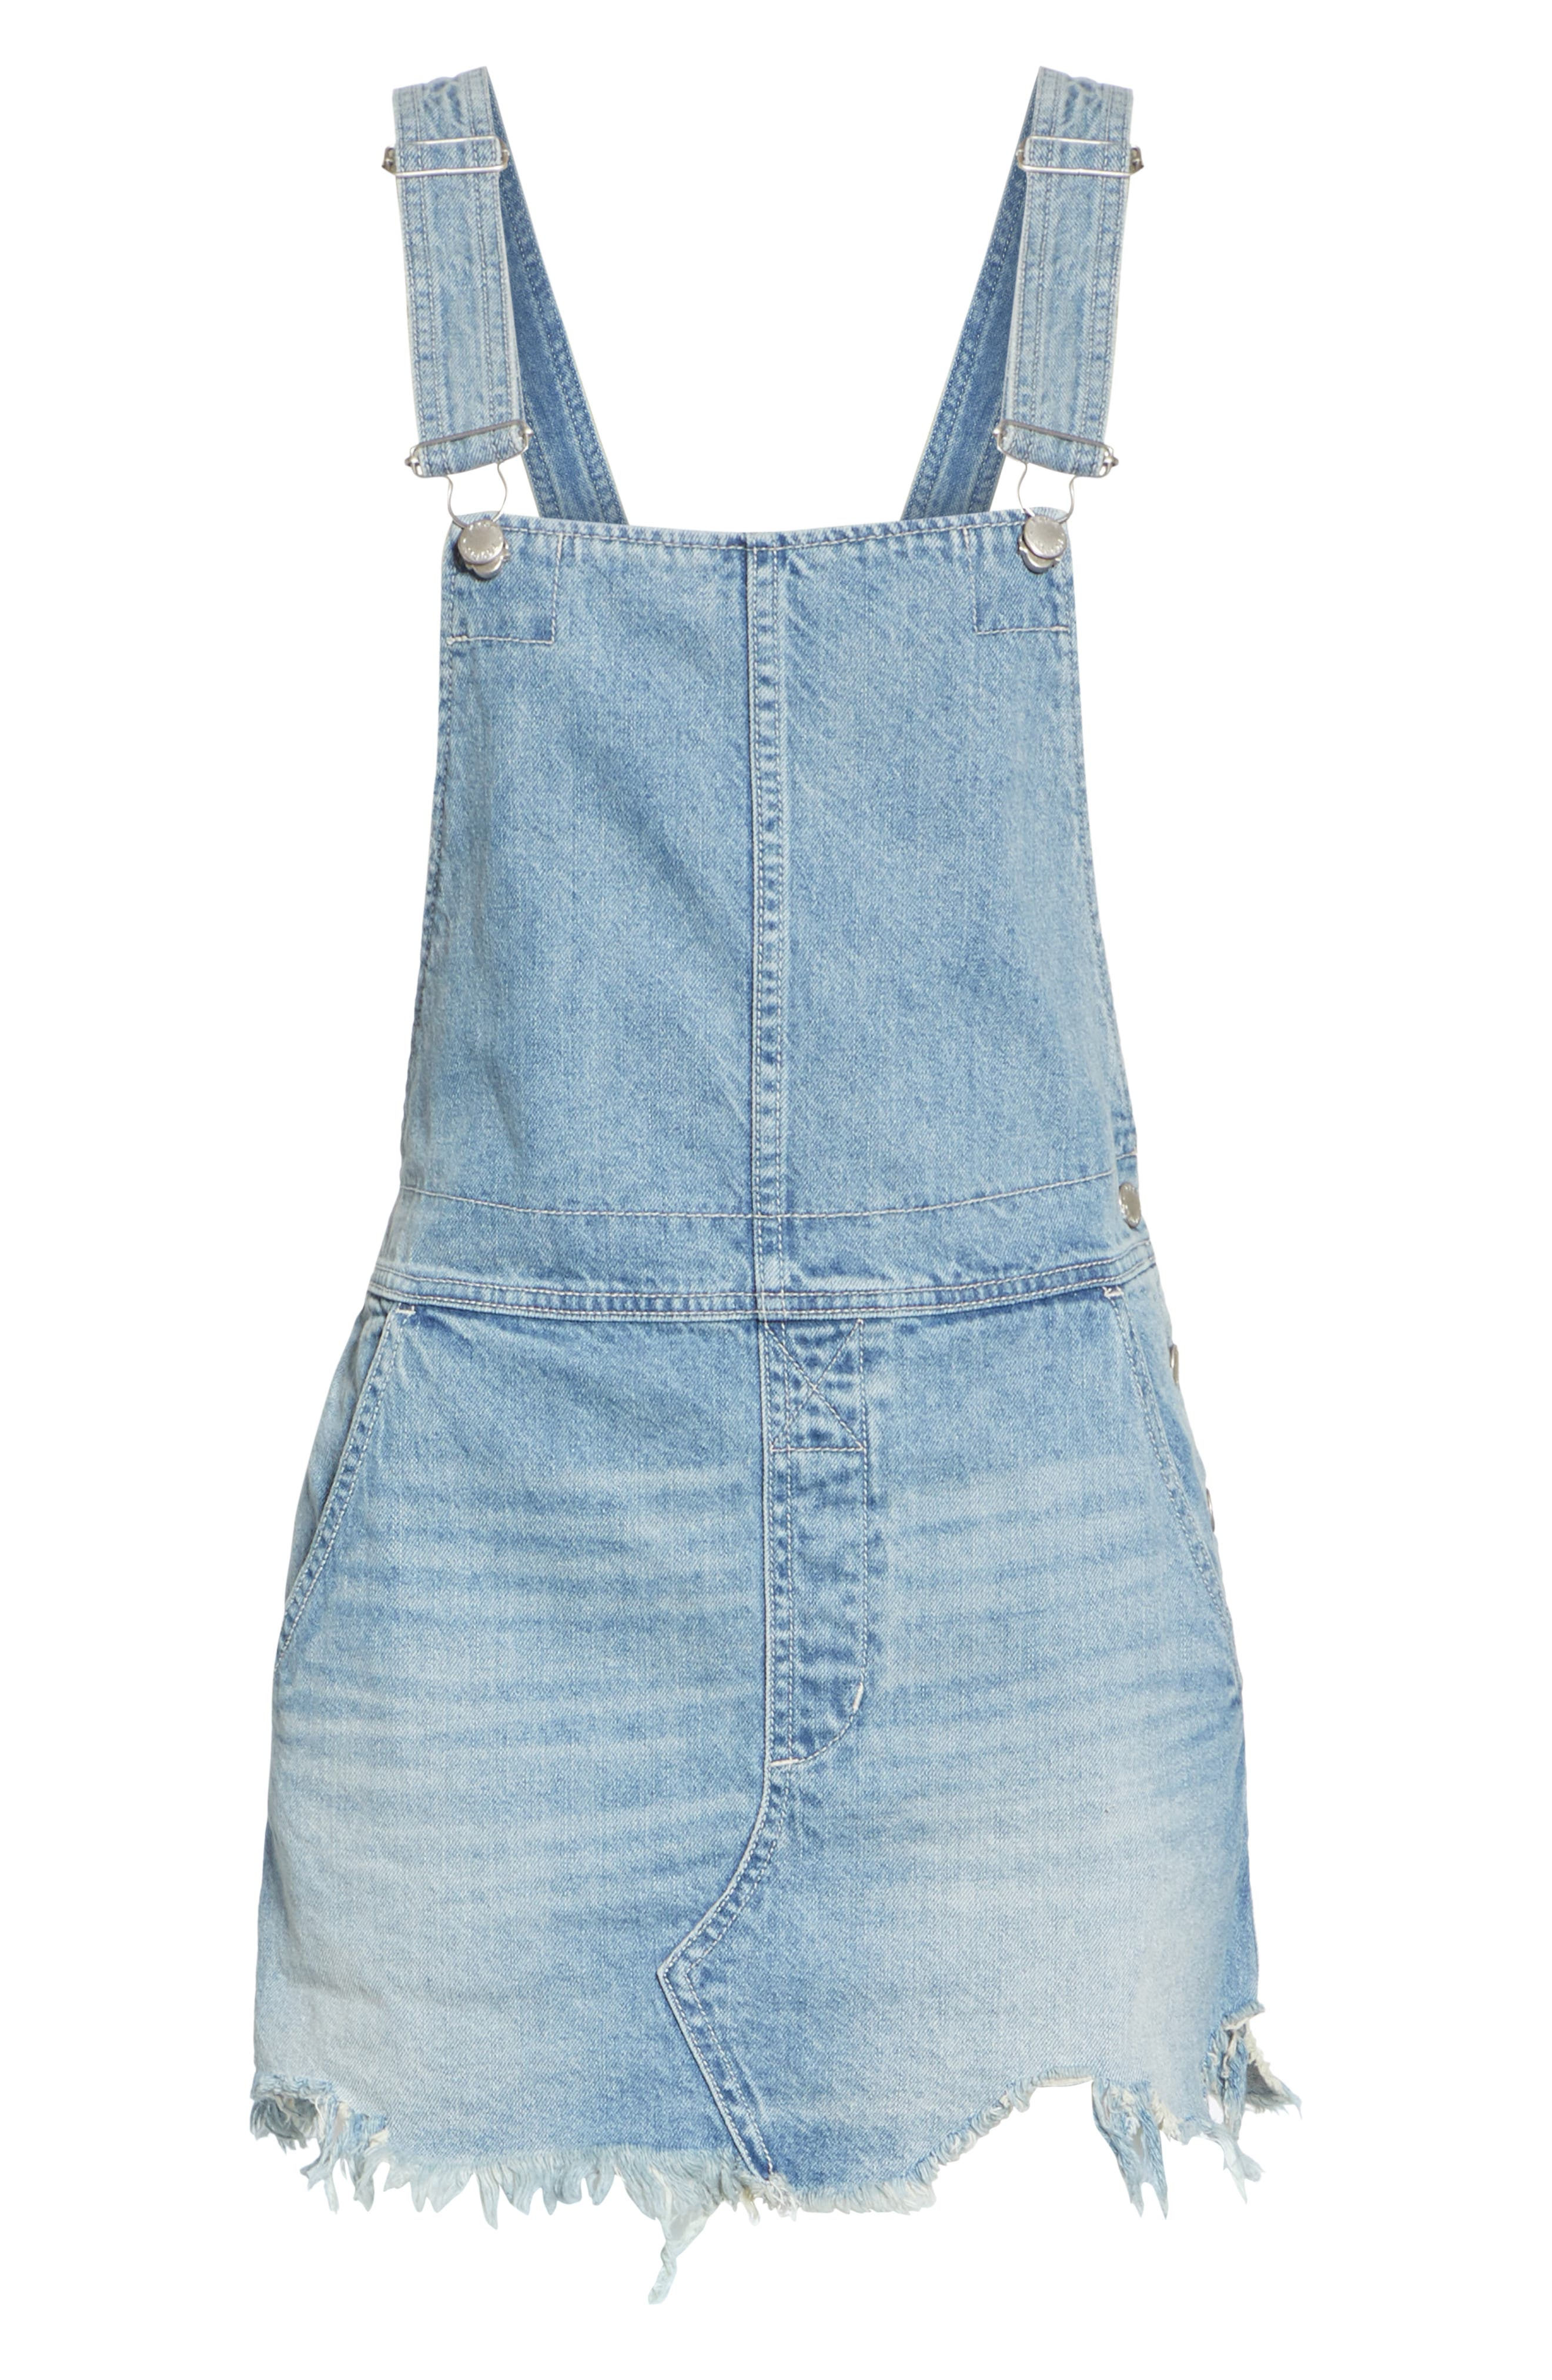 Torn-Up Skirt Overalls,                             Alternate thumbnail 6, color,                             400